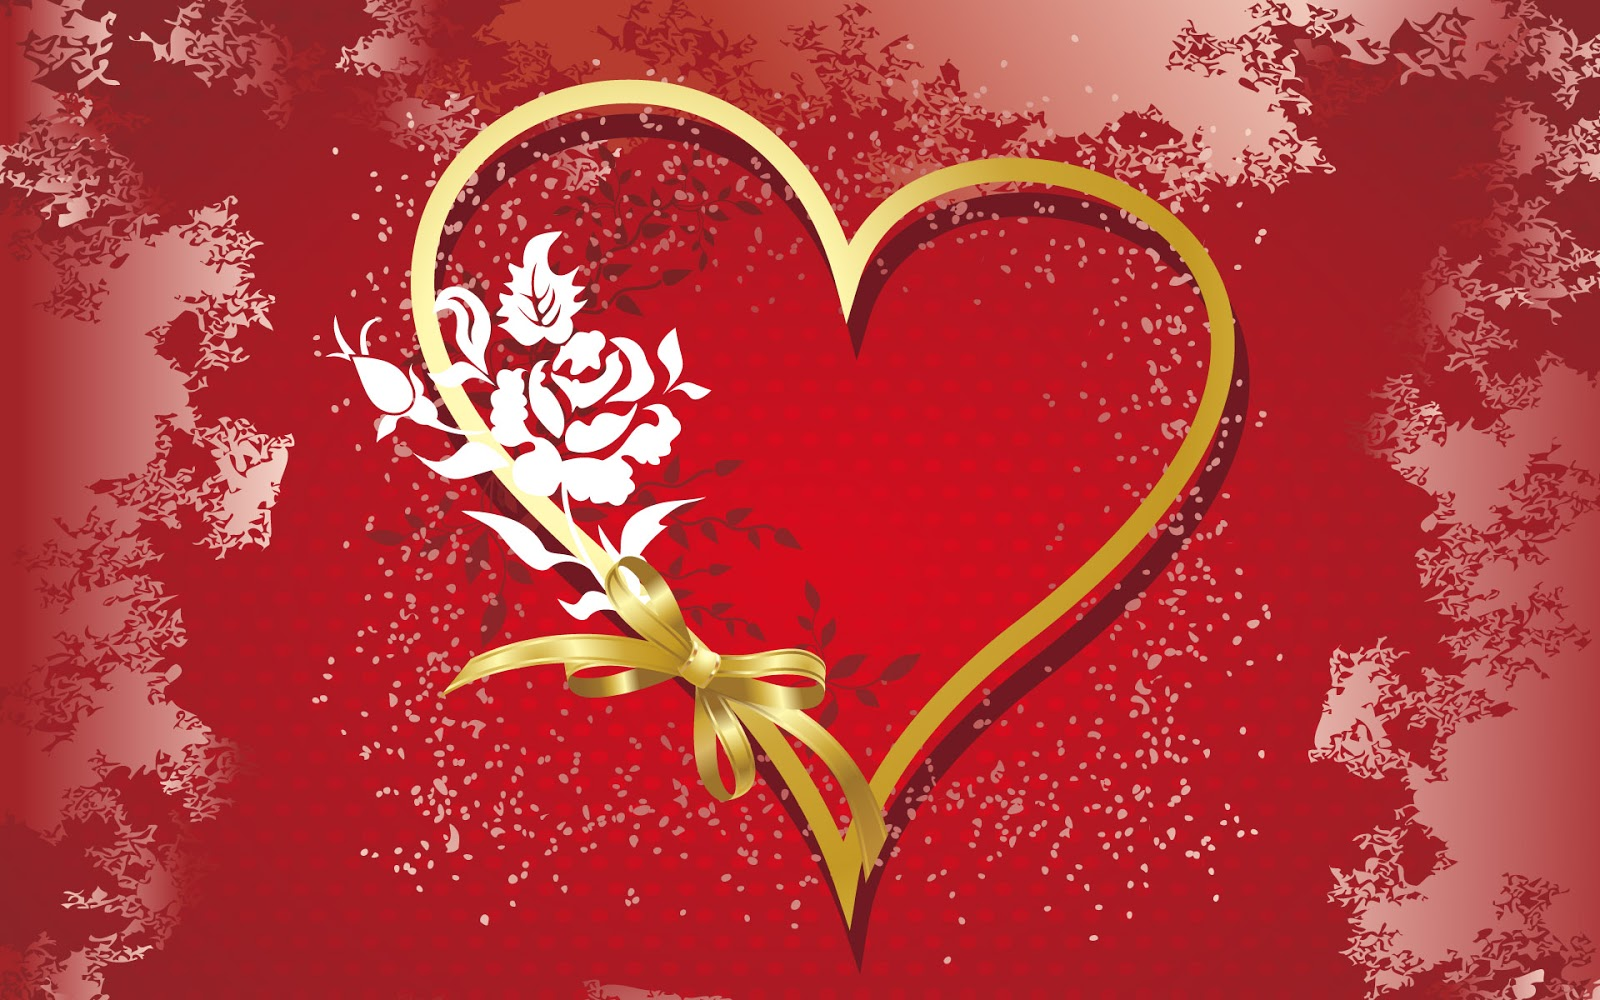 Fondos De Pantalla Animados De San Valentín: 15 Hermosos Imágenes De Fondo Para San Valentín